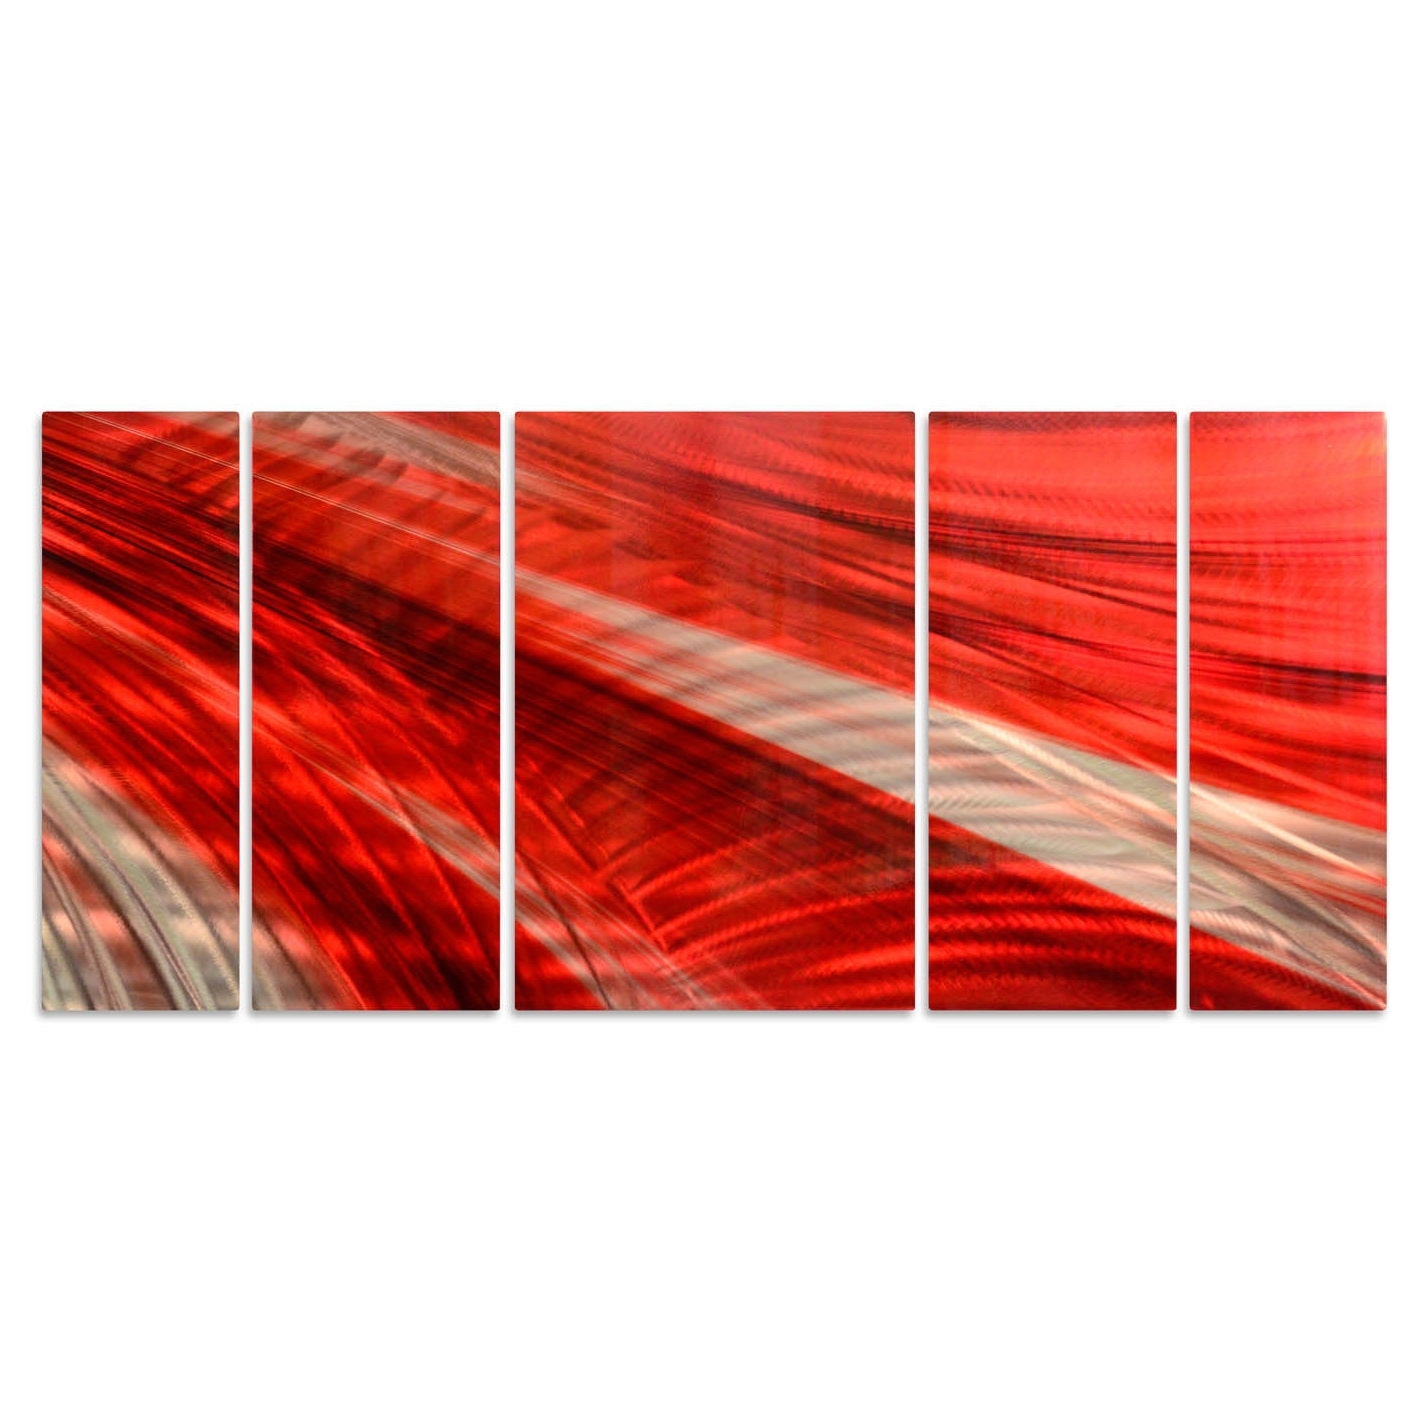 Ash Carl 'deep Red' Metal Wall Art Sculpture – Free Shipping Today Regarding Preferred Ash Carl Metal Art (View 2 of 15)